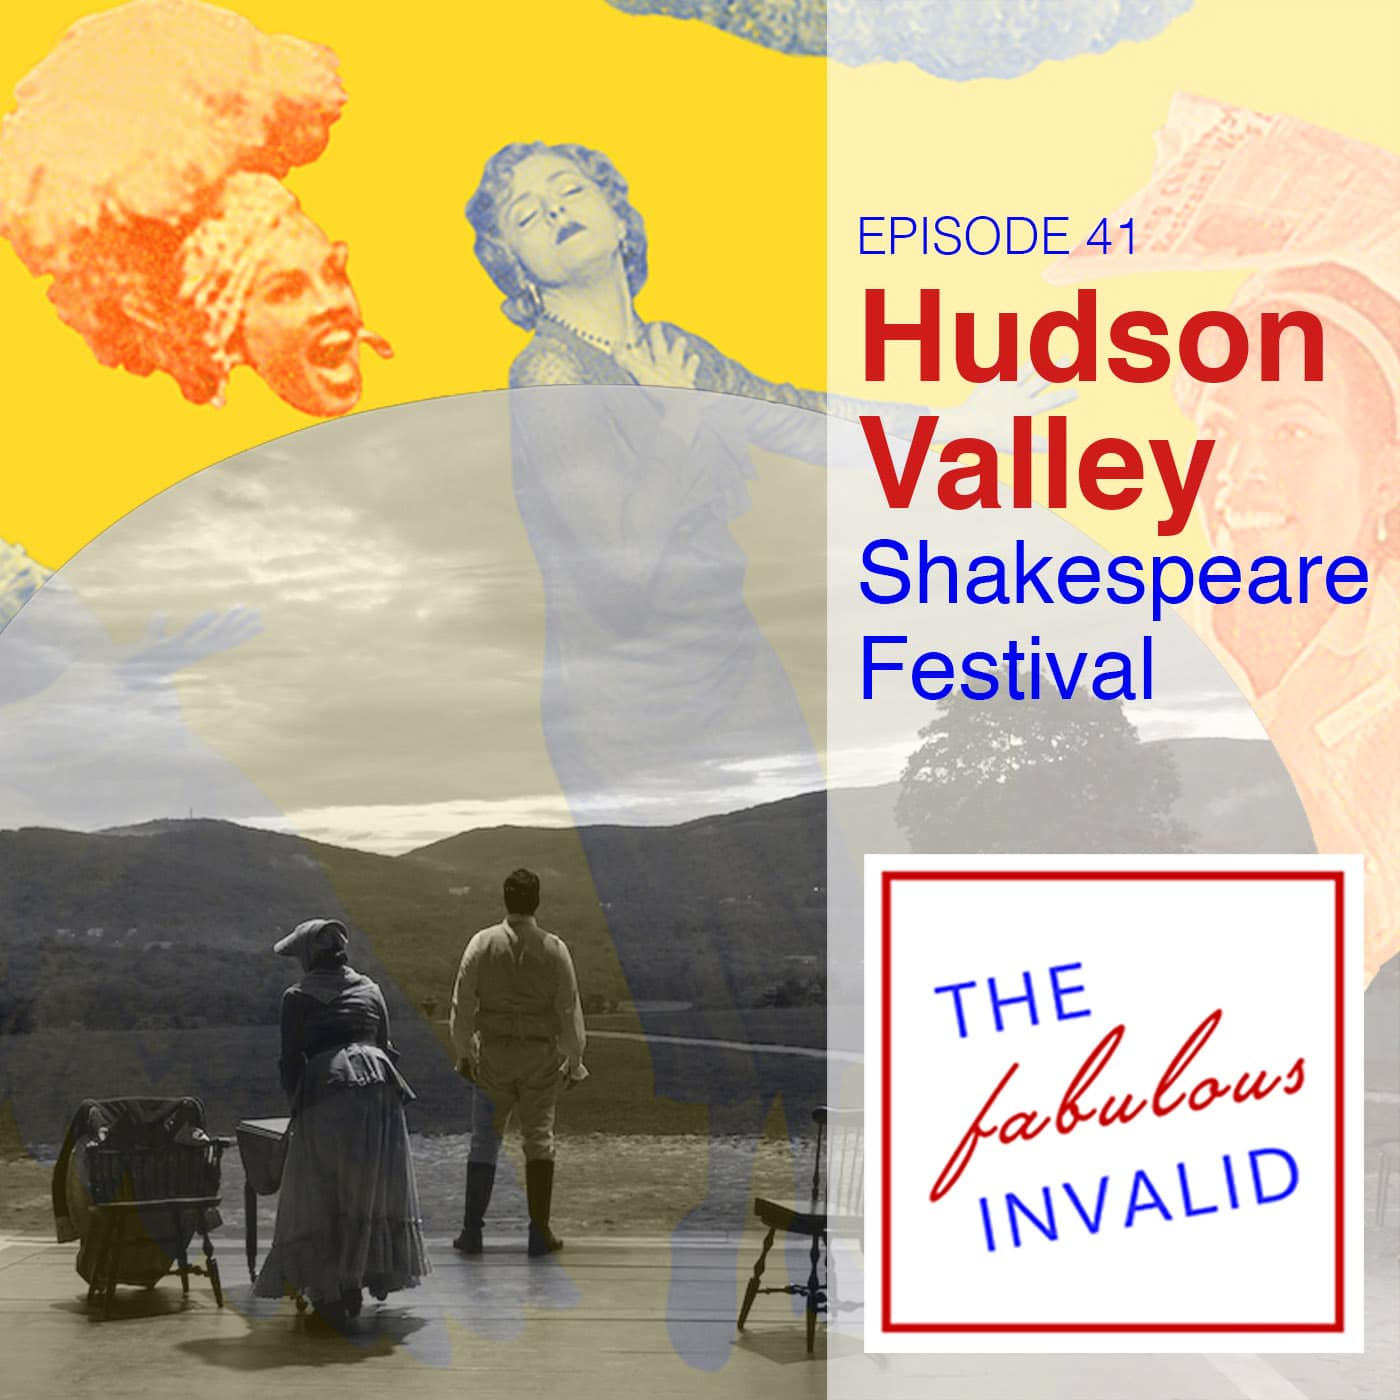 The Fabulous Invalid Ep 41 Hudson Valley Shakespeare Festival